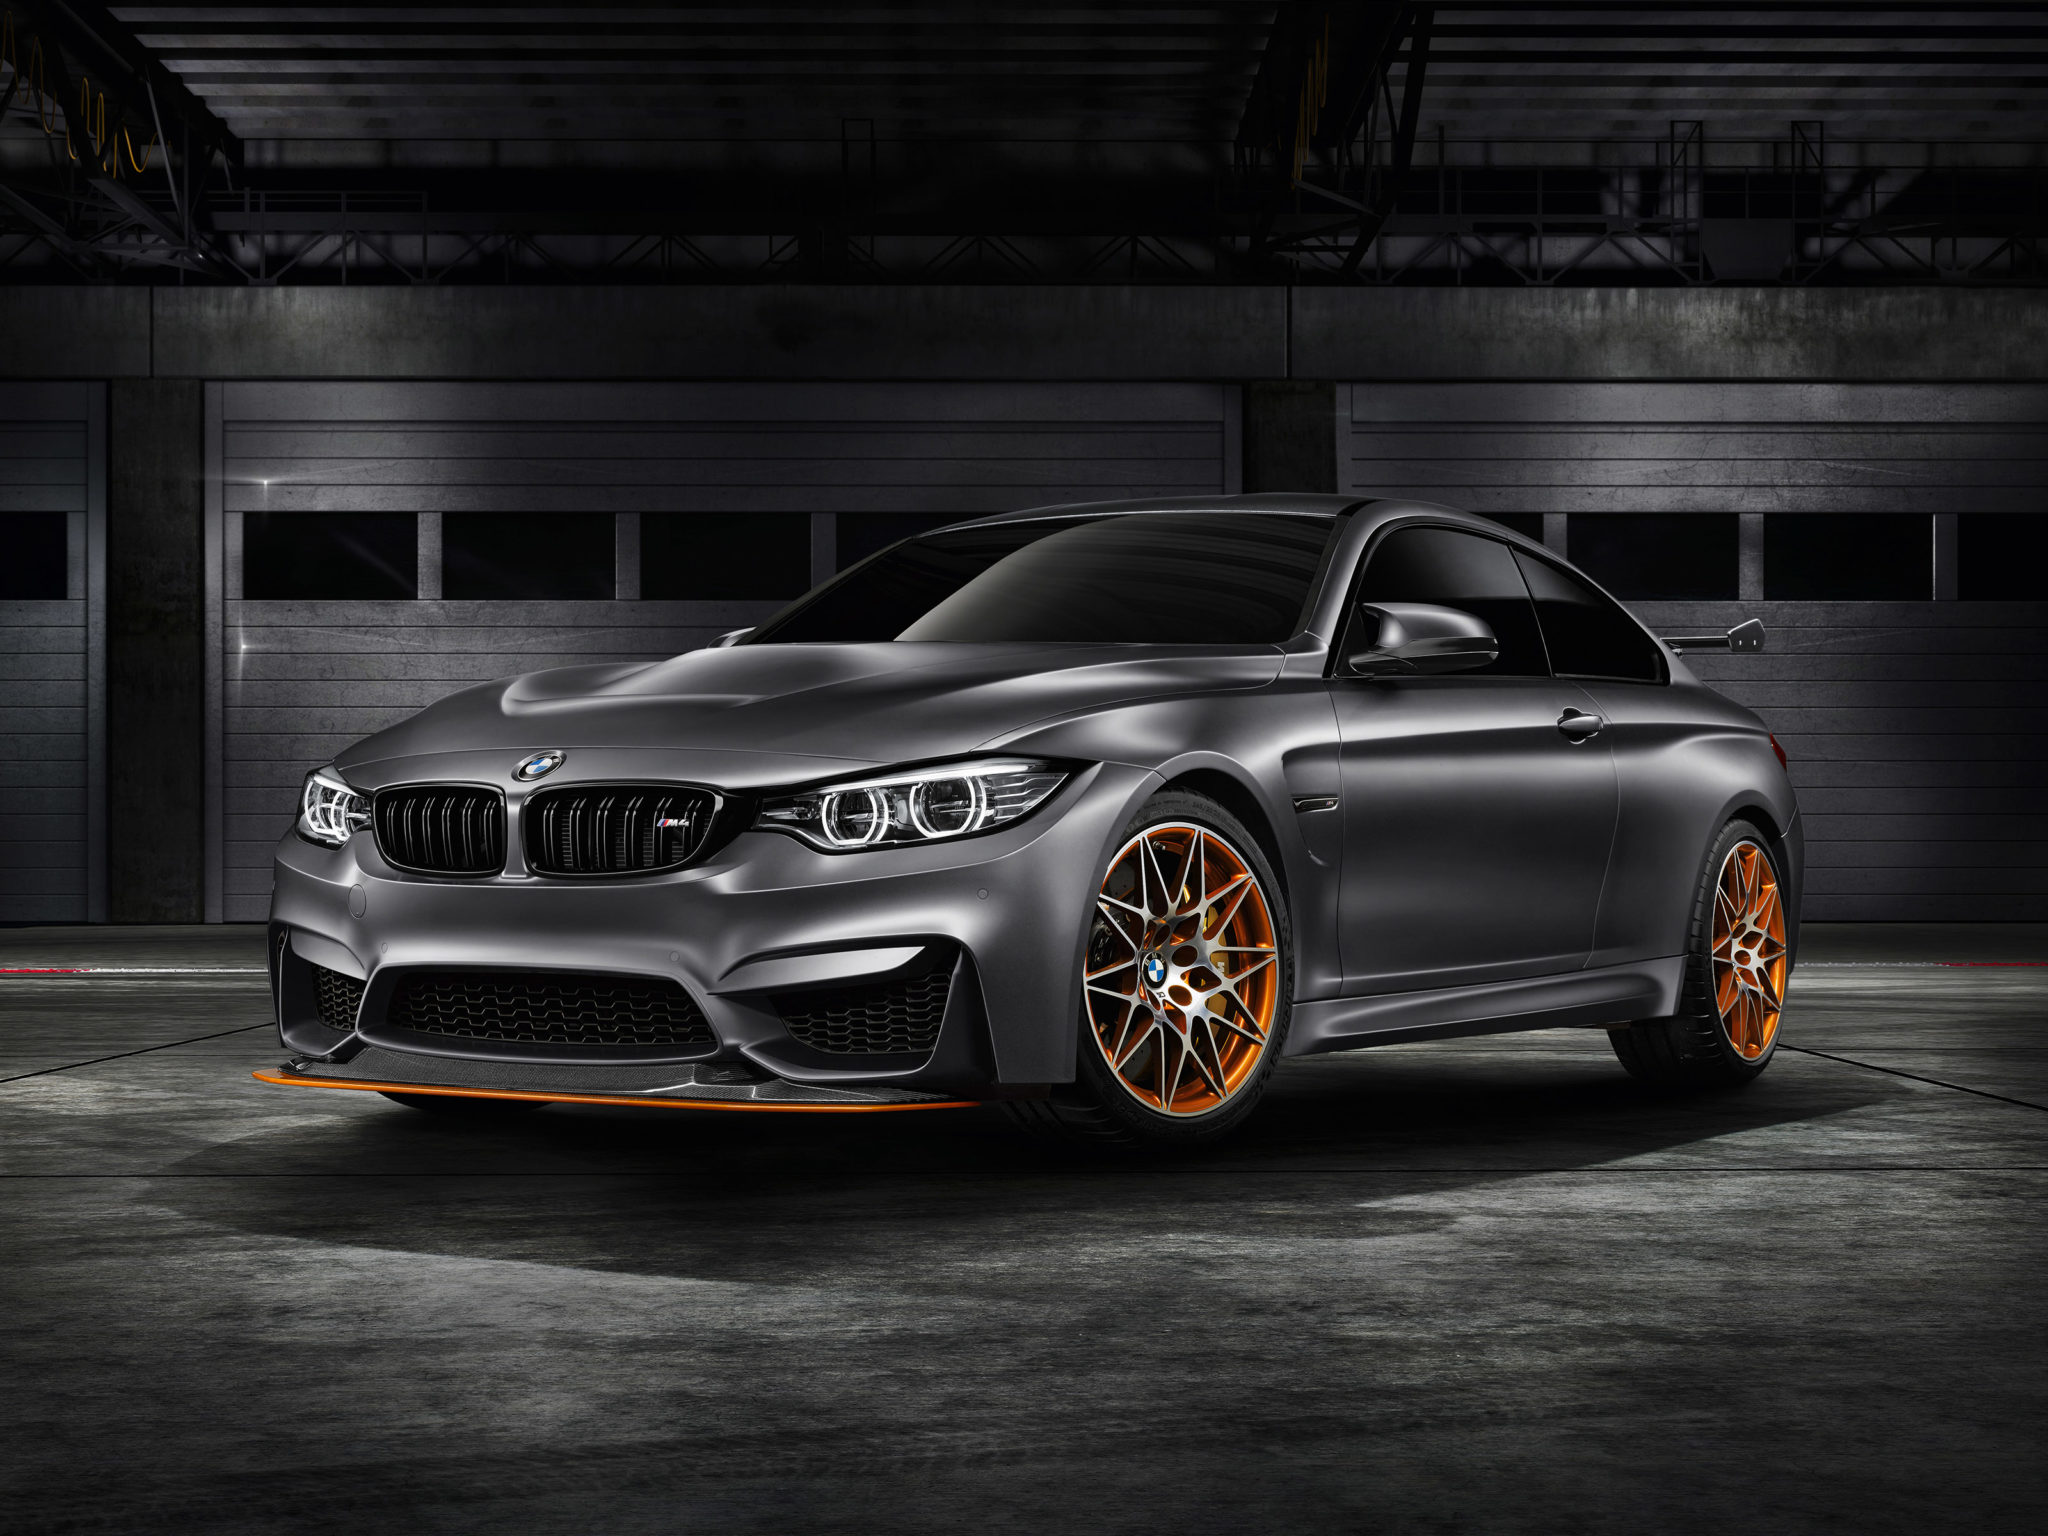 2015 Bmw Concept M4 GTS F82